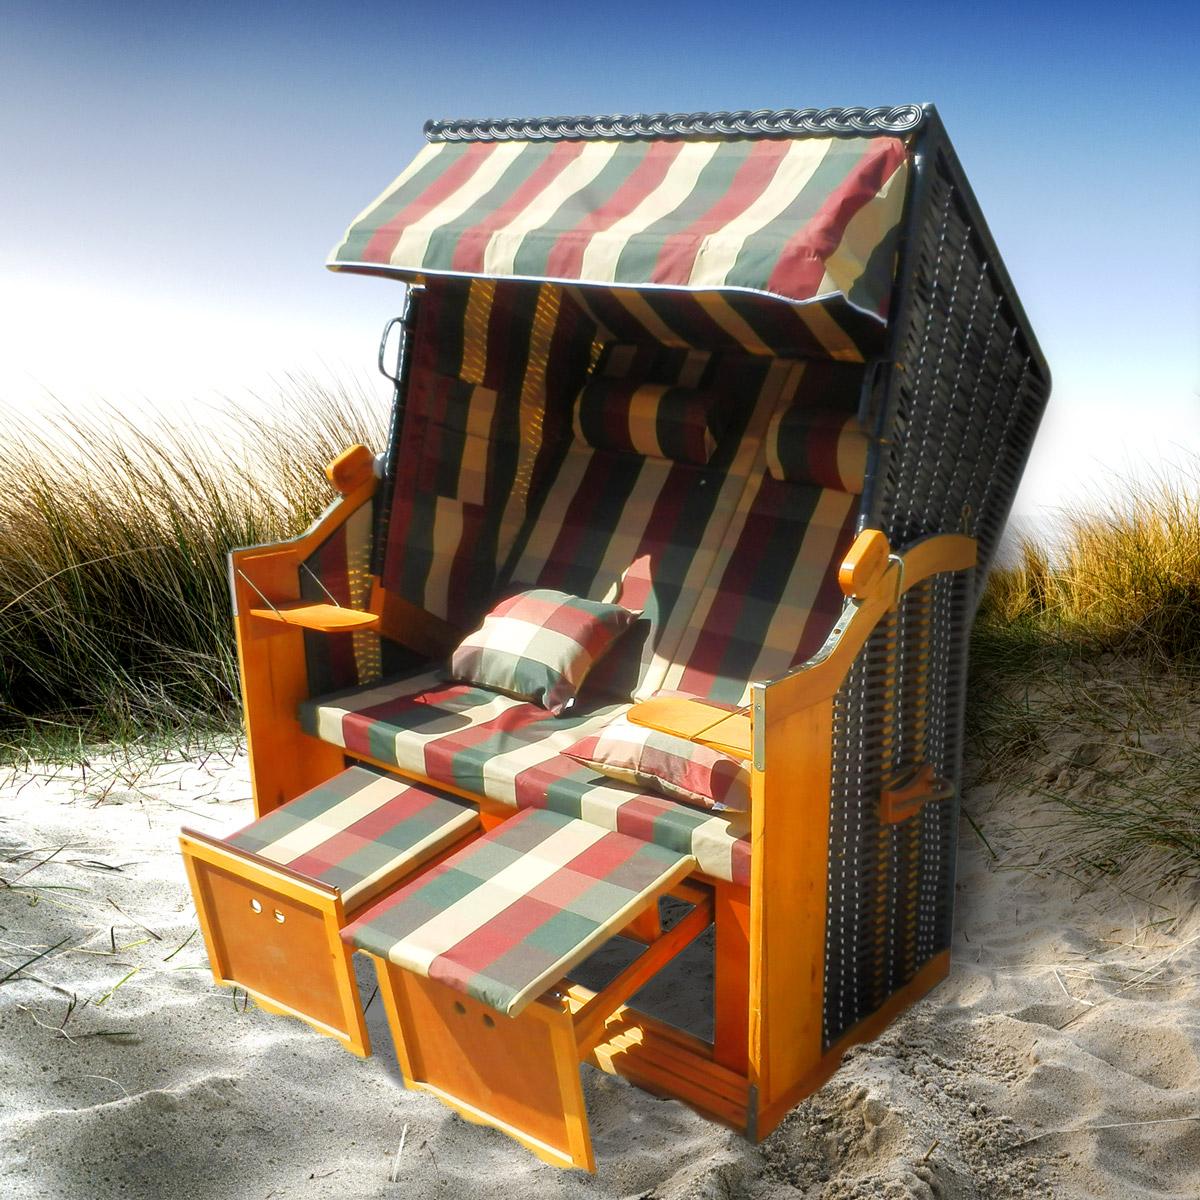 strandkorb premium volllieger ostsee gartenliege. Black Bedroom Furniture Sets. Home Design Ideas